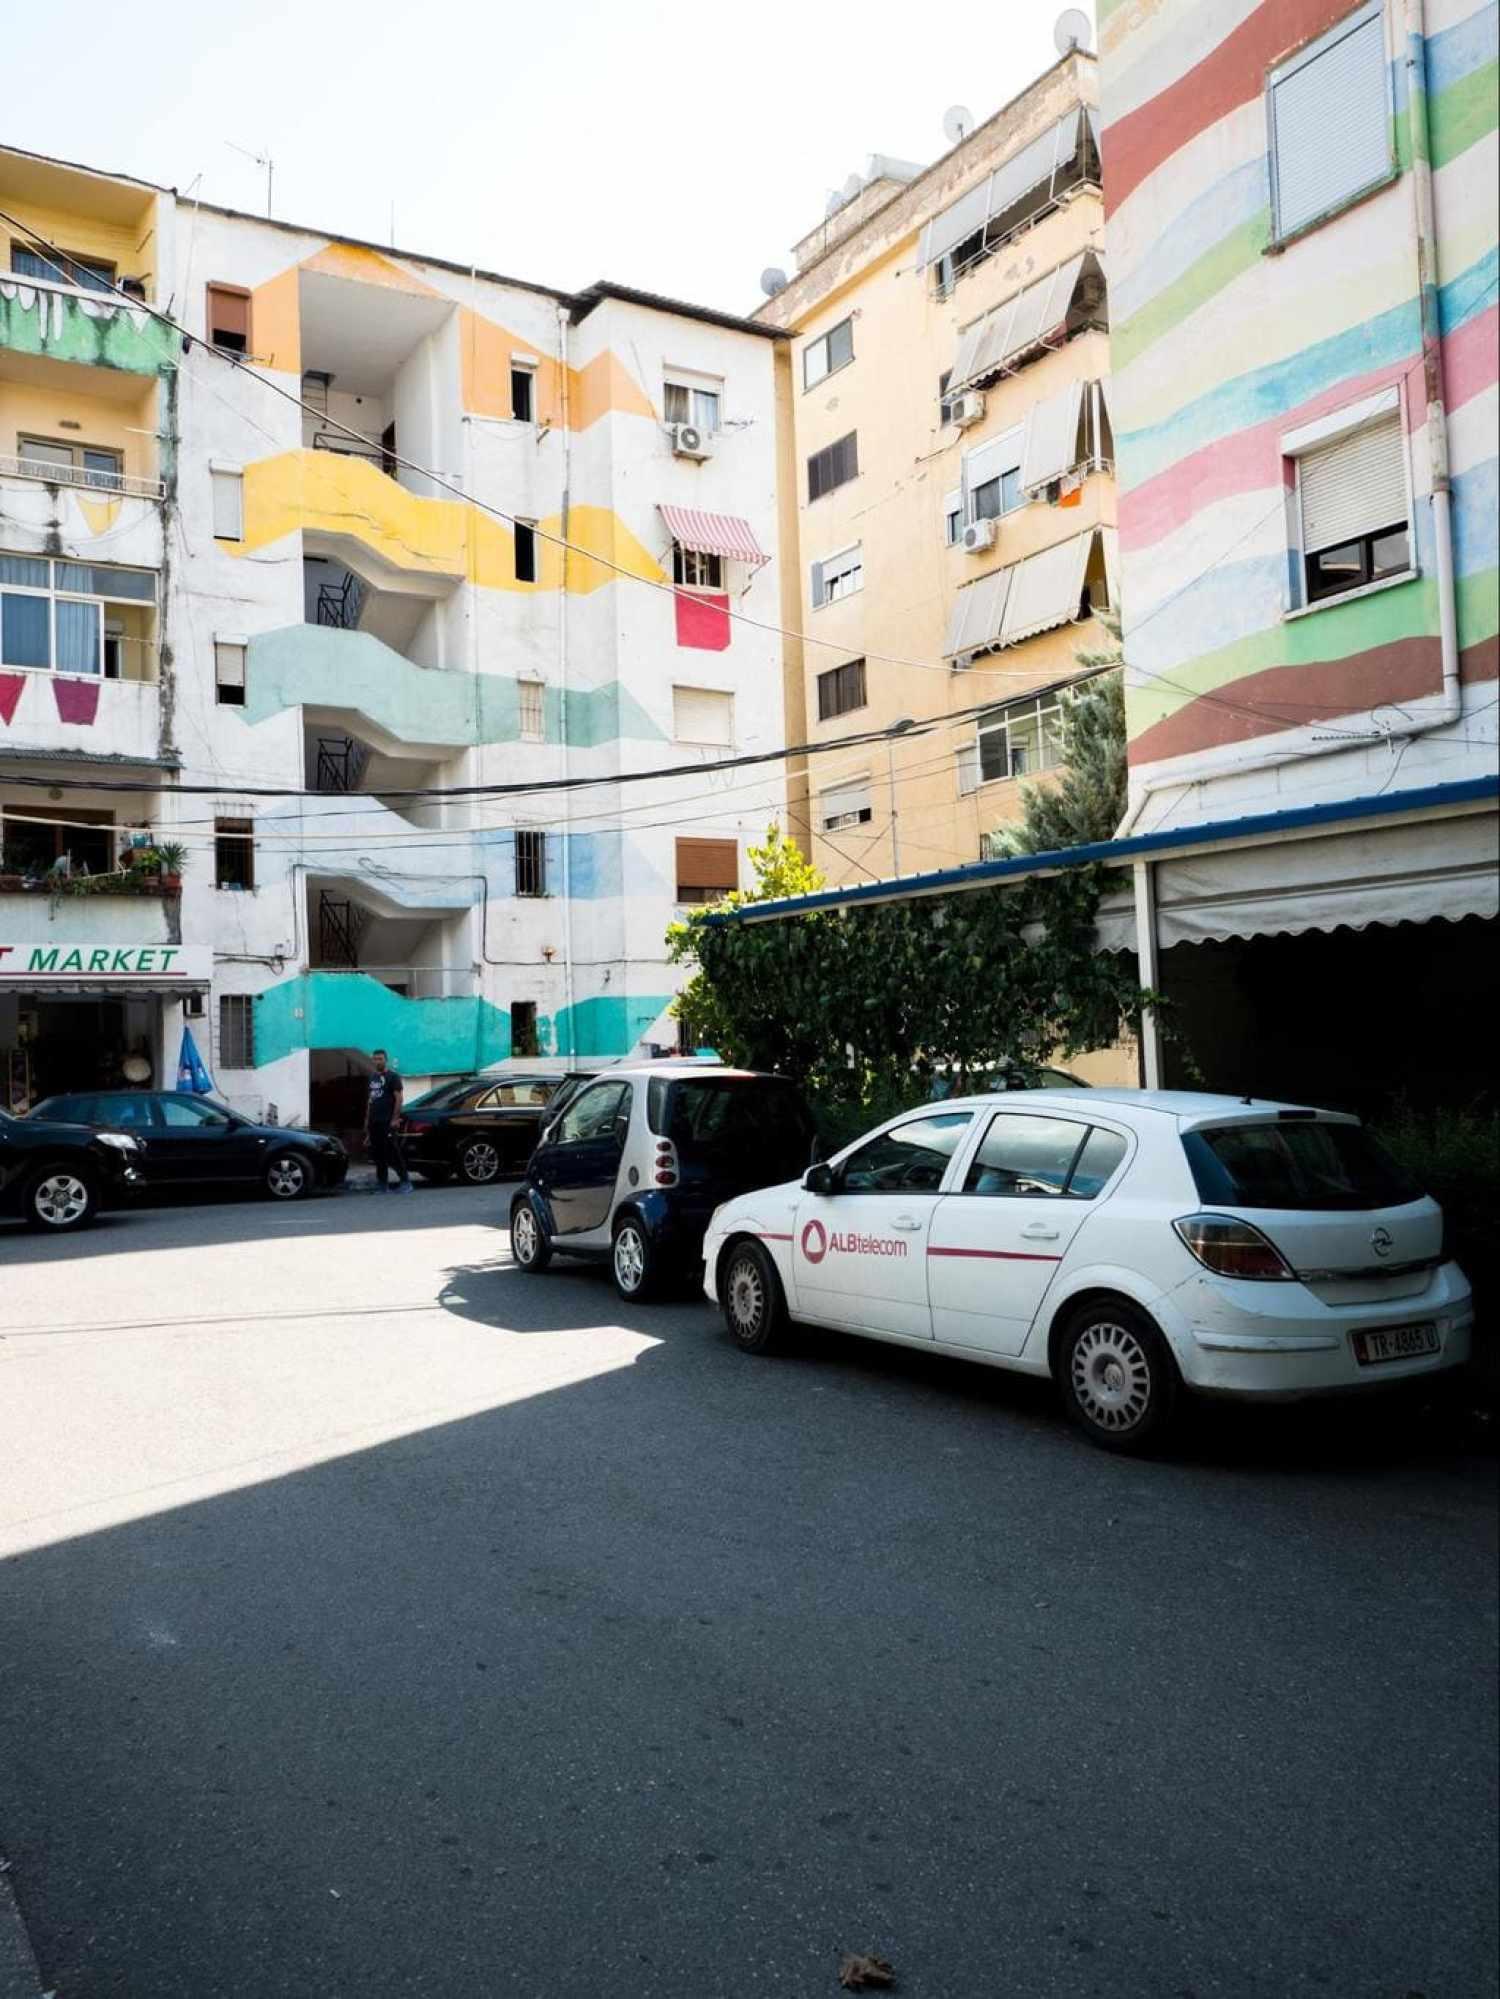 Colorful building facades of Tirana